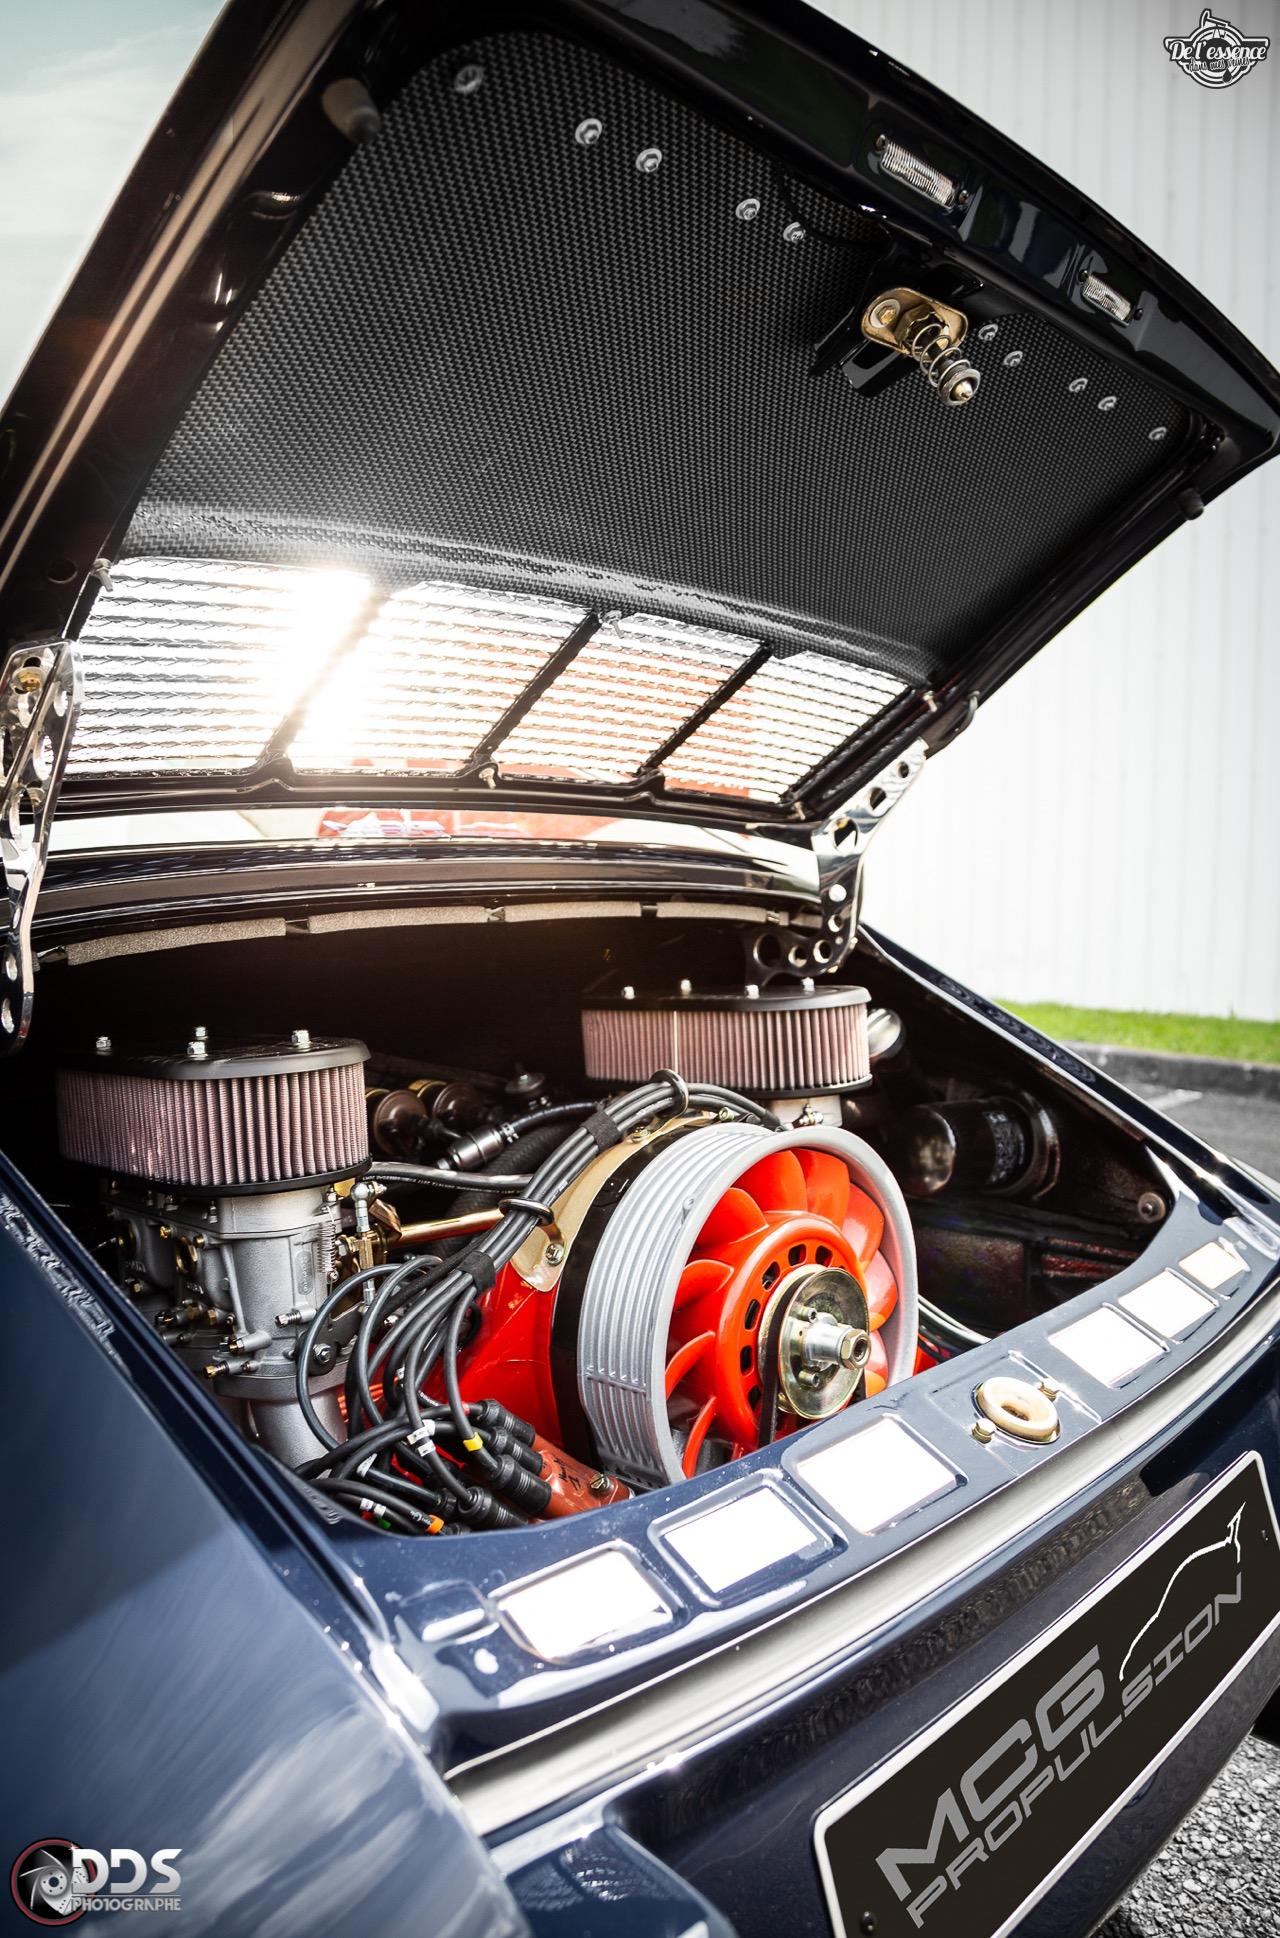 Porsche 911 3.0l SC Backdating - Signée MCG Propulsion ! 33